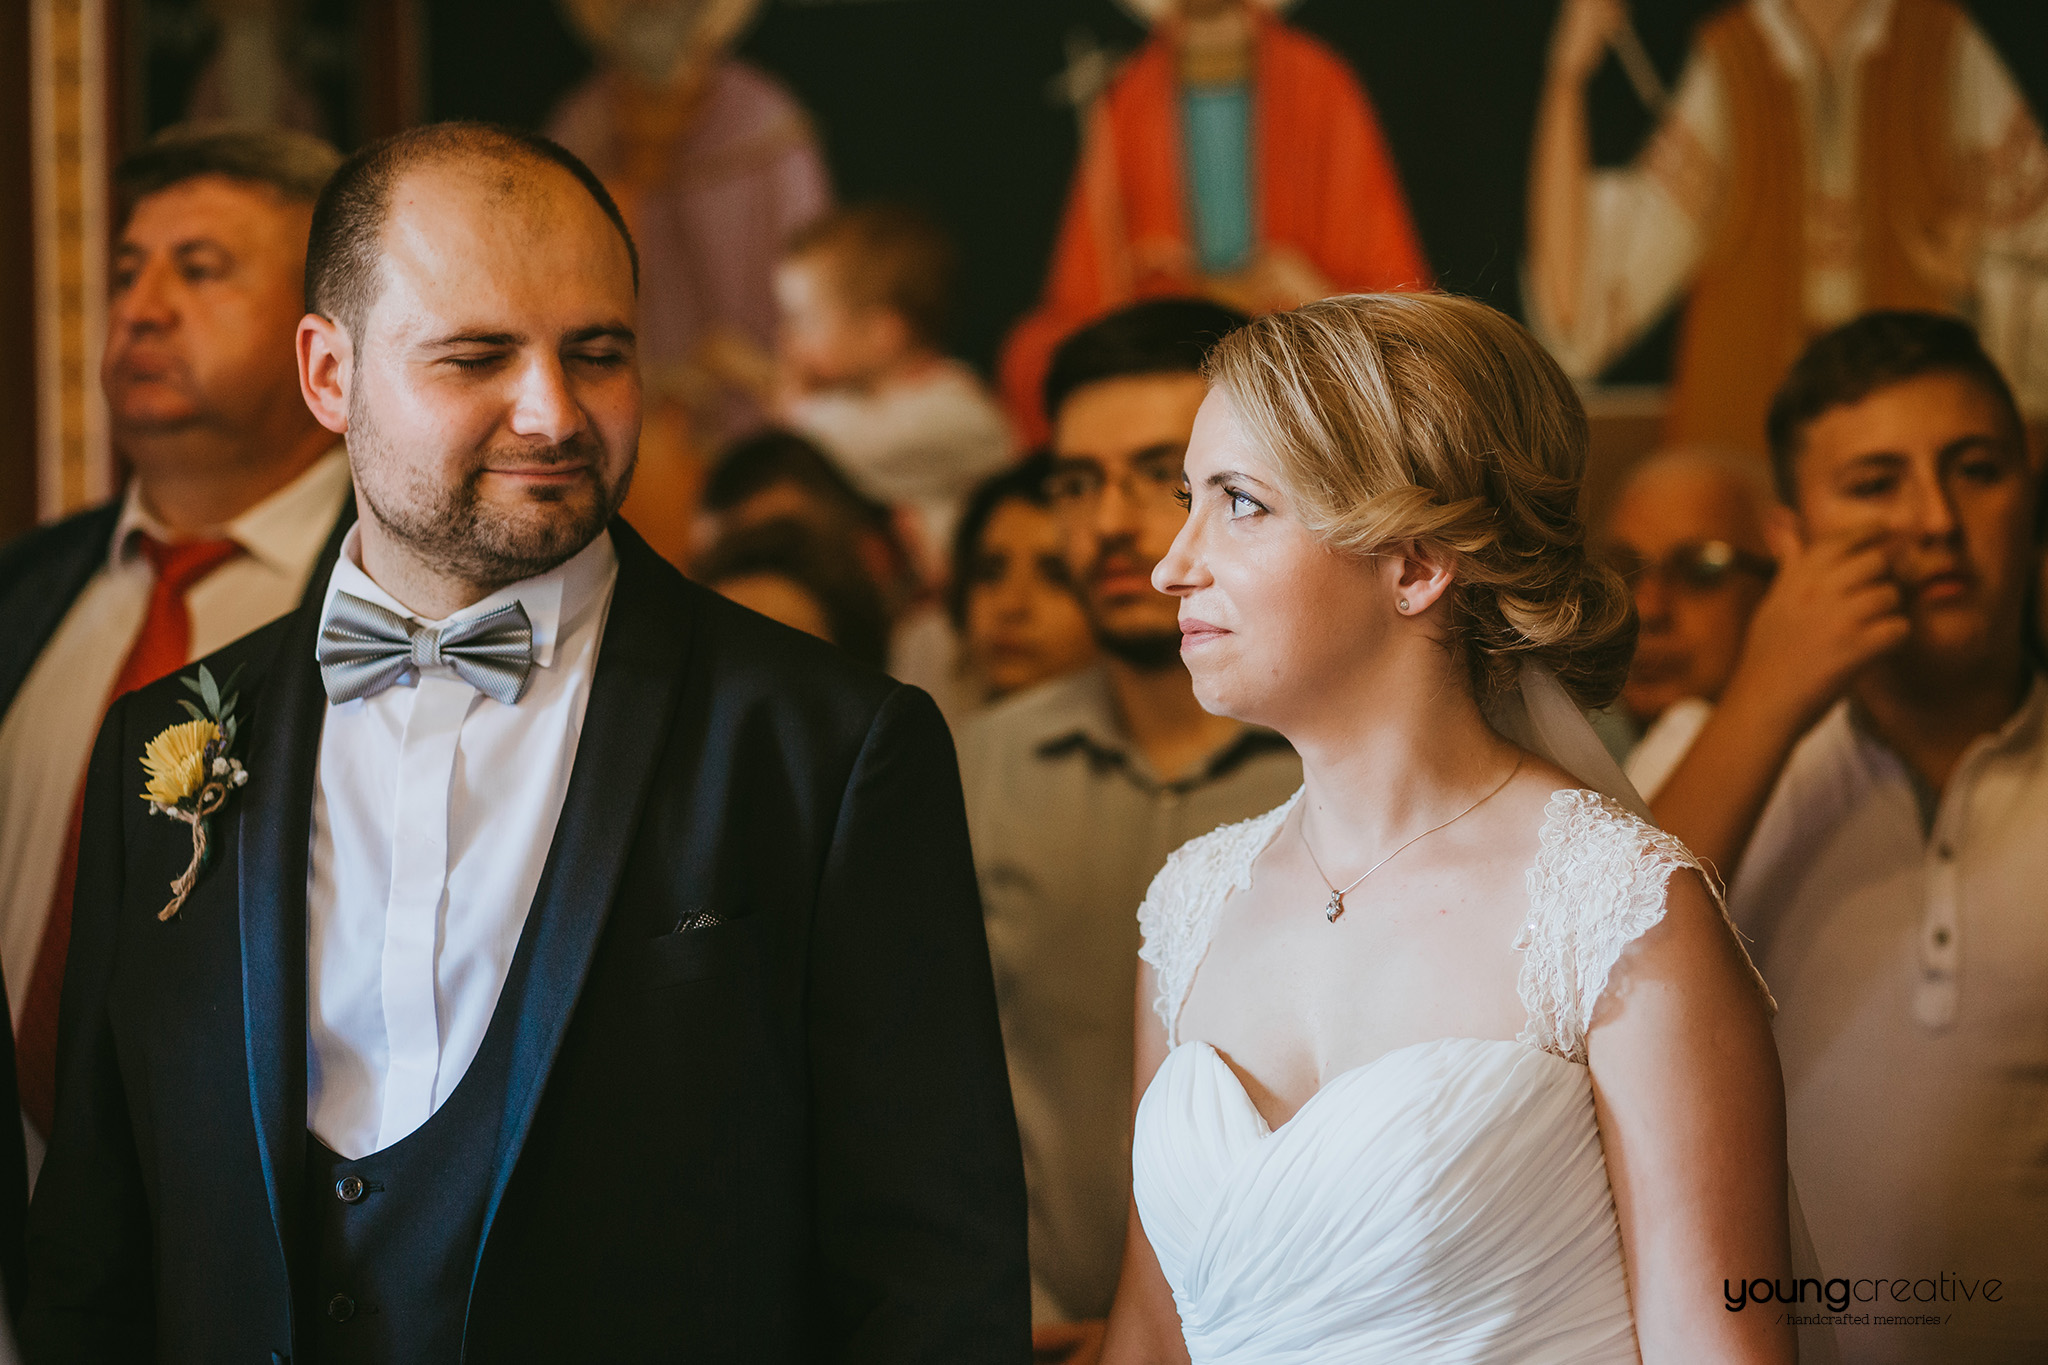 Iuliana & Cristian | youngcreative.info media © Dan Filipciuc, Cristina Bejan | fotografie nunta Roman